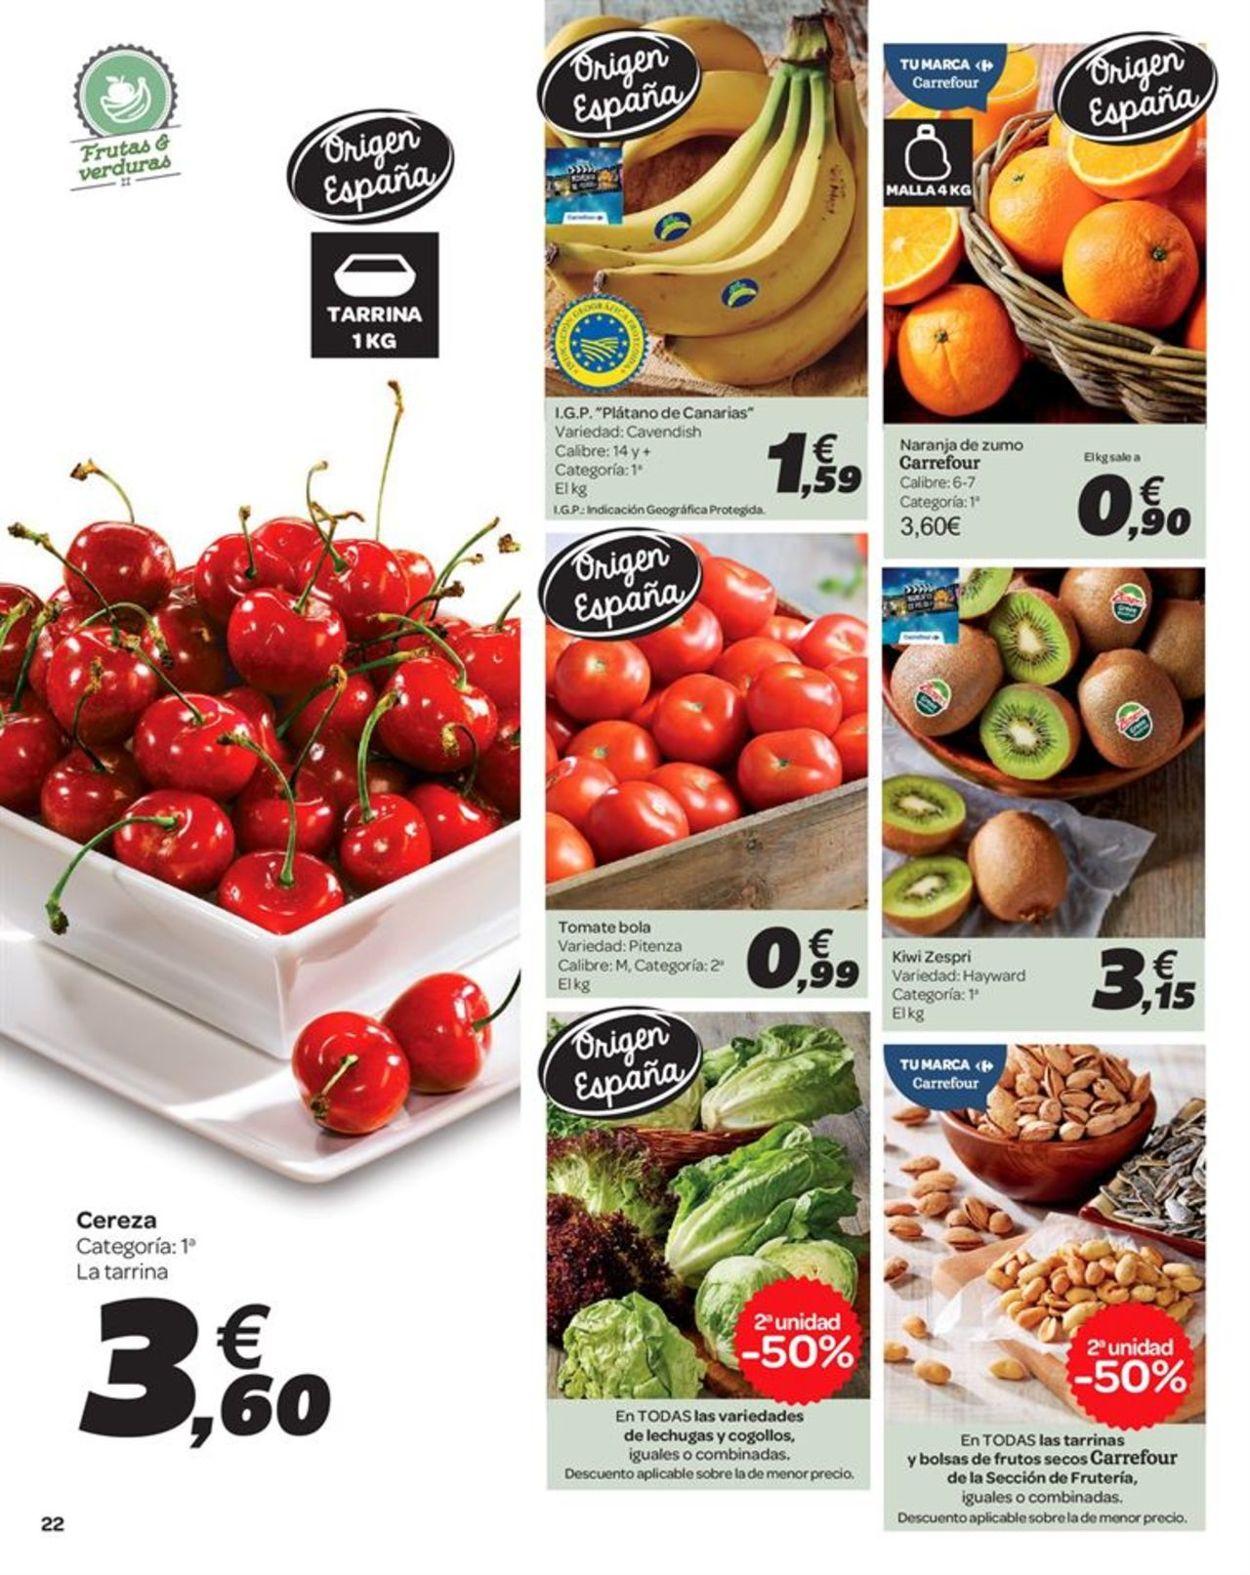 Carrefour Folleto - 12.06-20.06.2019 (Página 22)